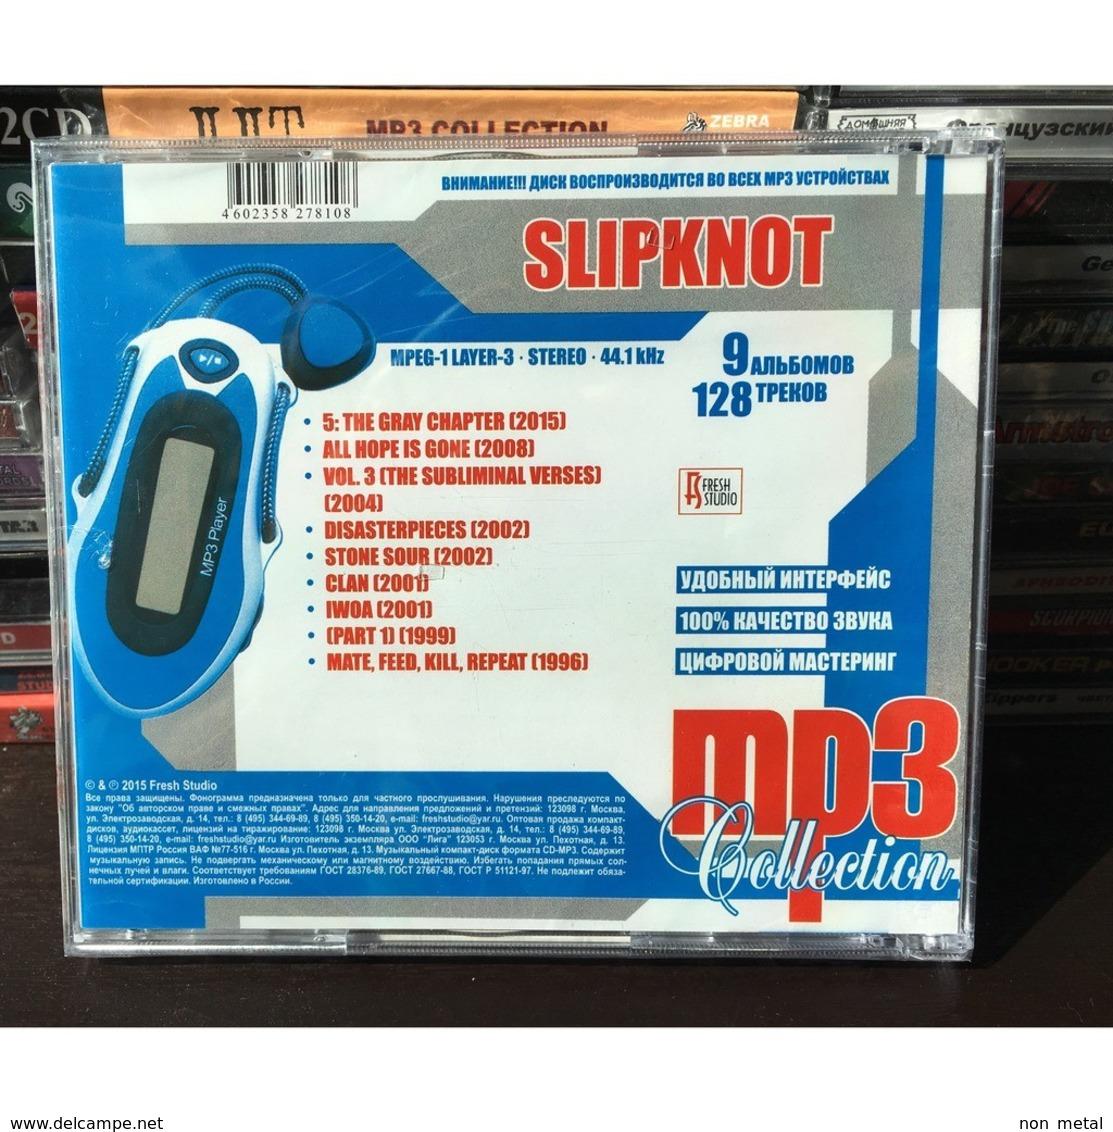 Slipknot: MP3 Collection 9 Albums (Fresh Rec) Rus - Rock